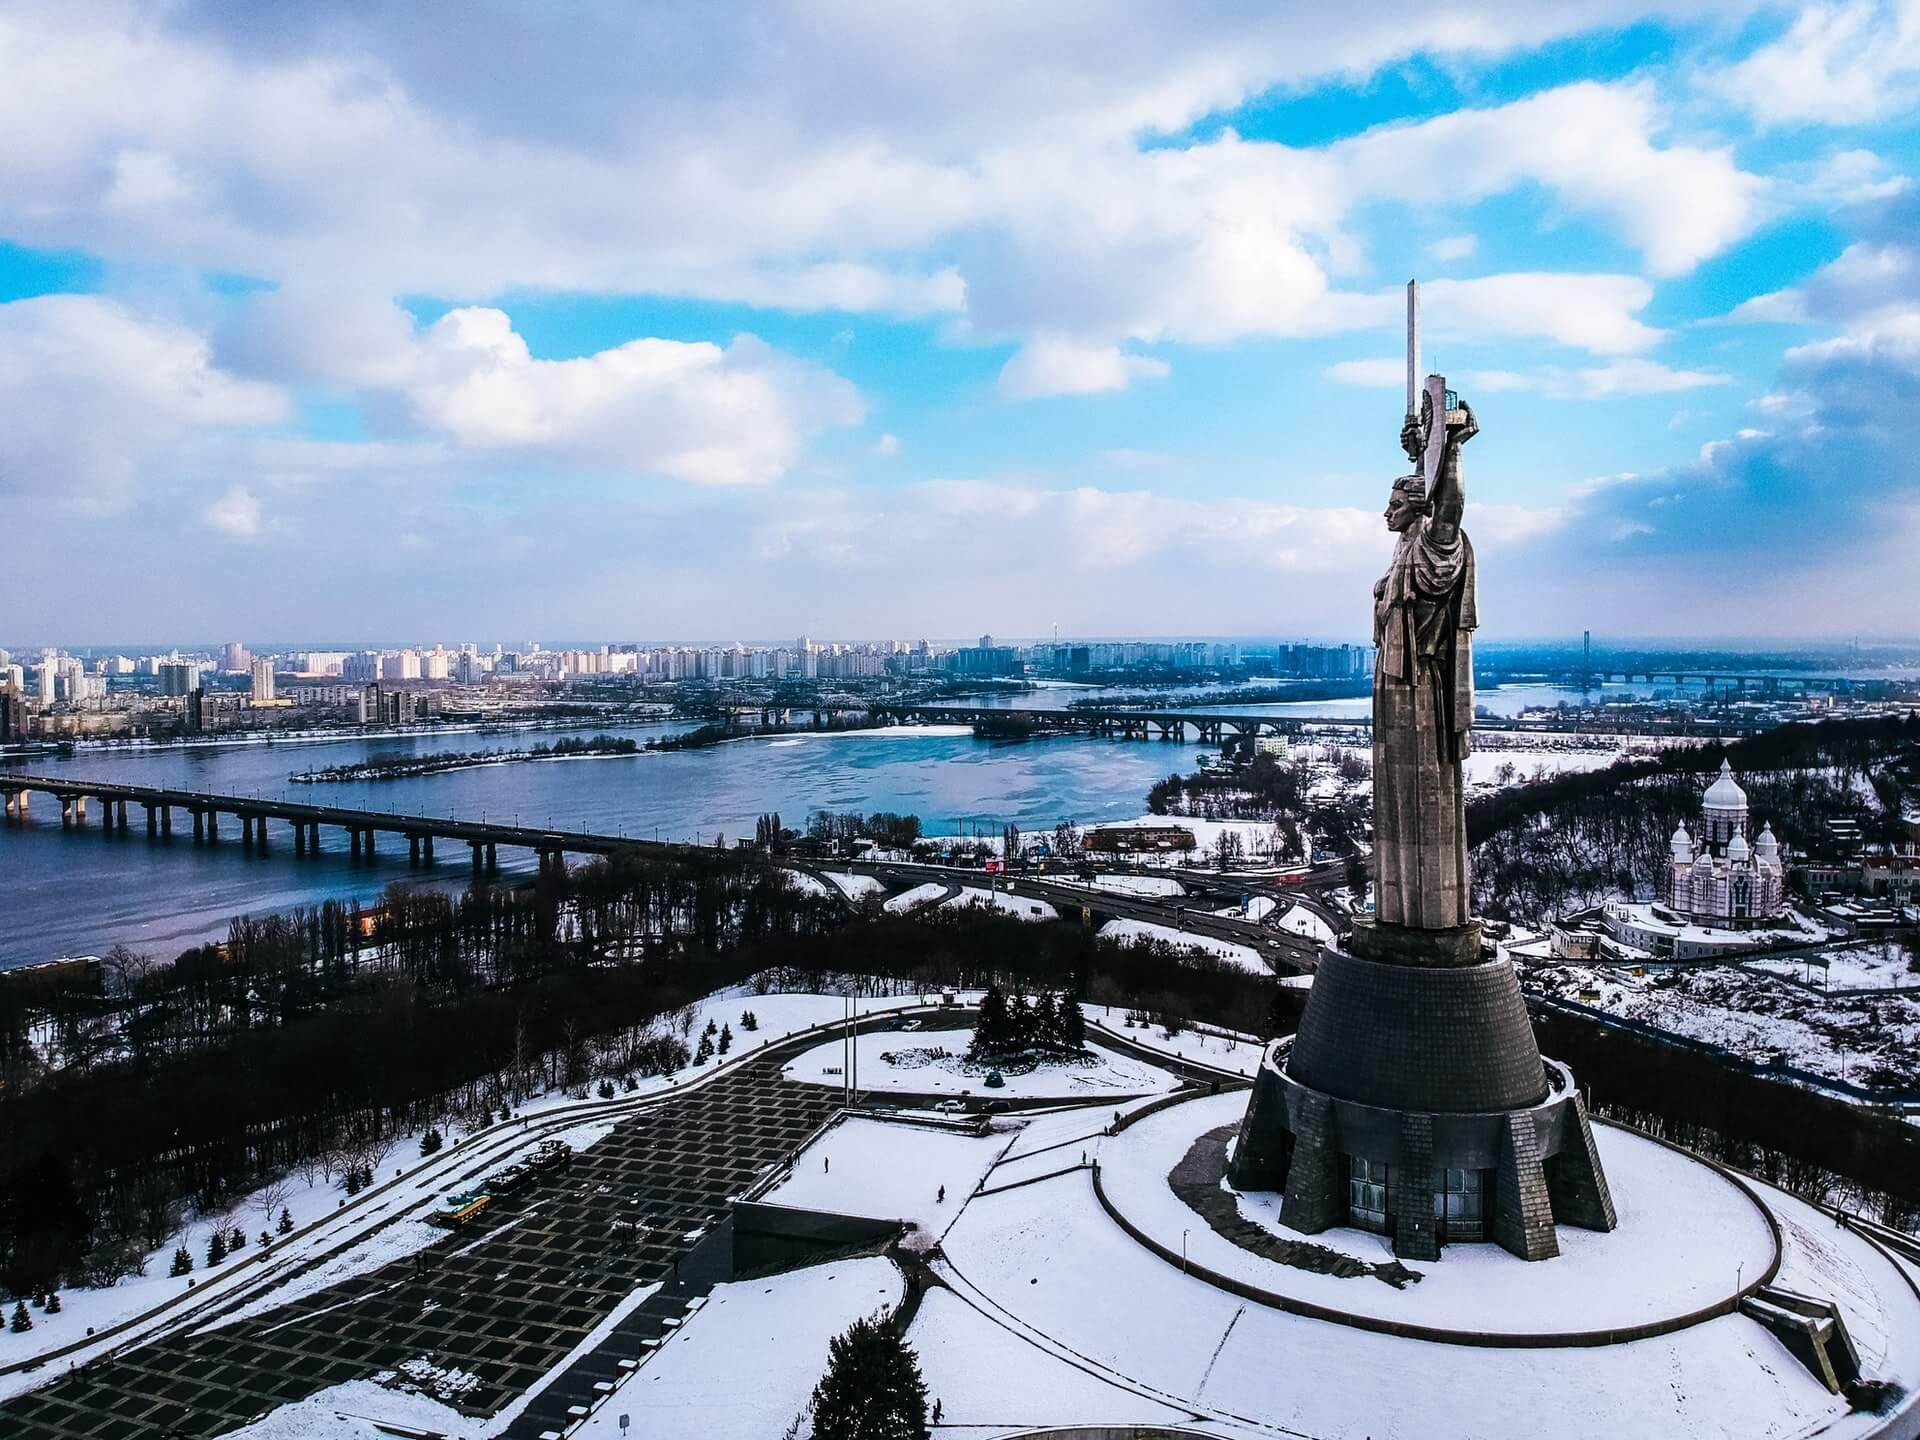 Snowy winter day at a landmark in Kyiv - Ukraine's capital city